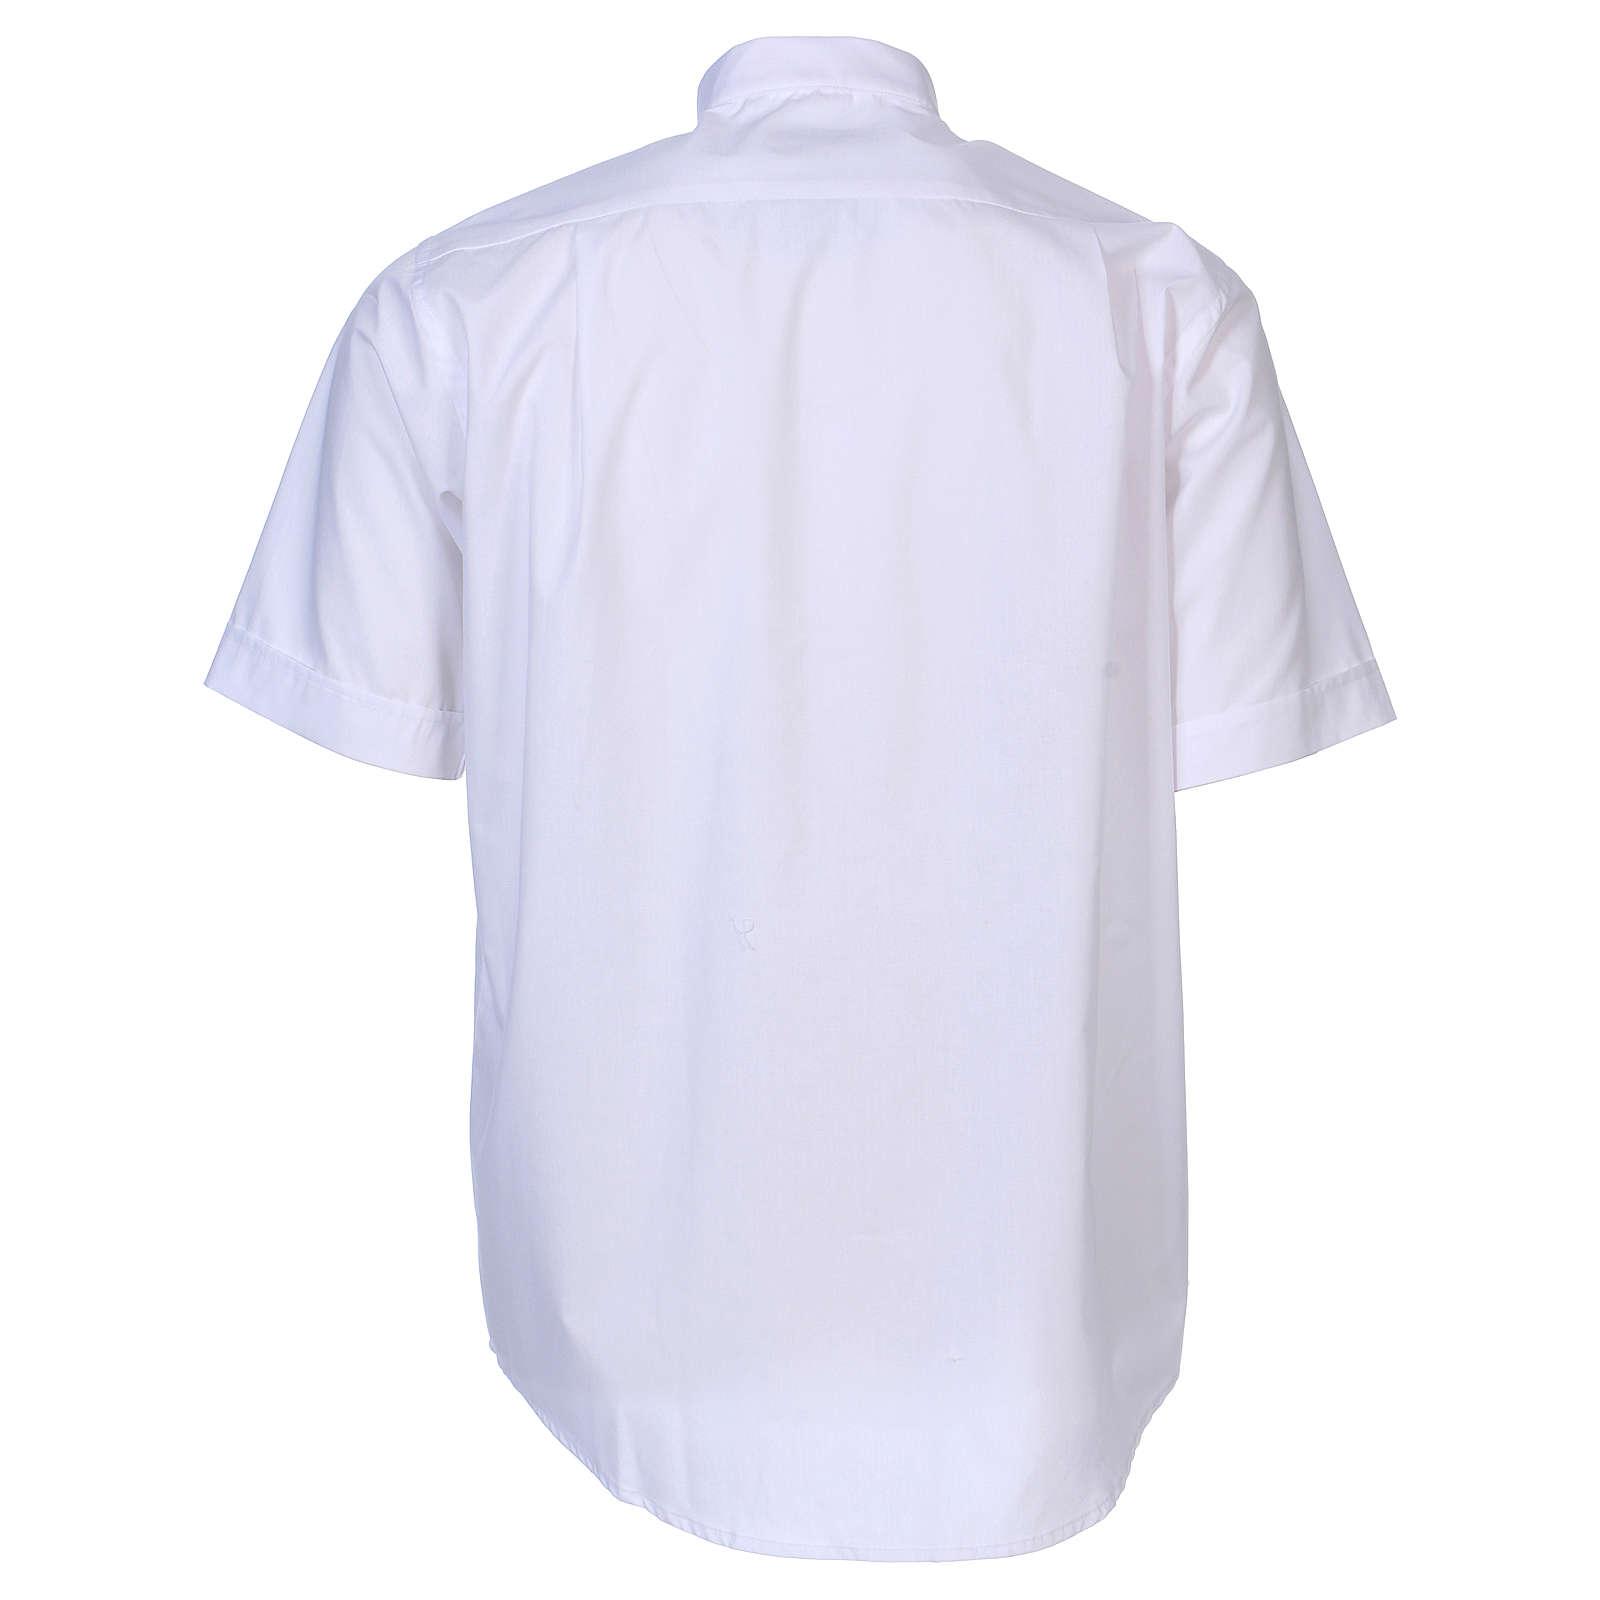 Camisa clergyman manga corta mixto algodón blanca In Primis 4